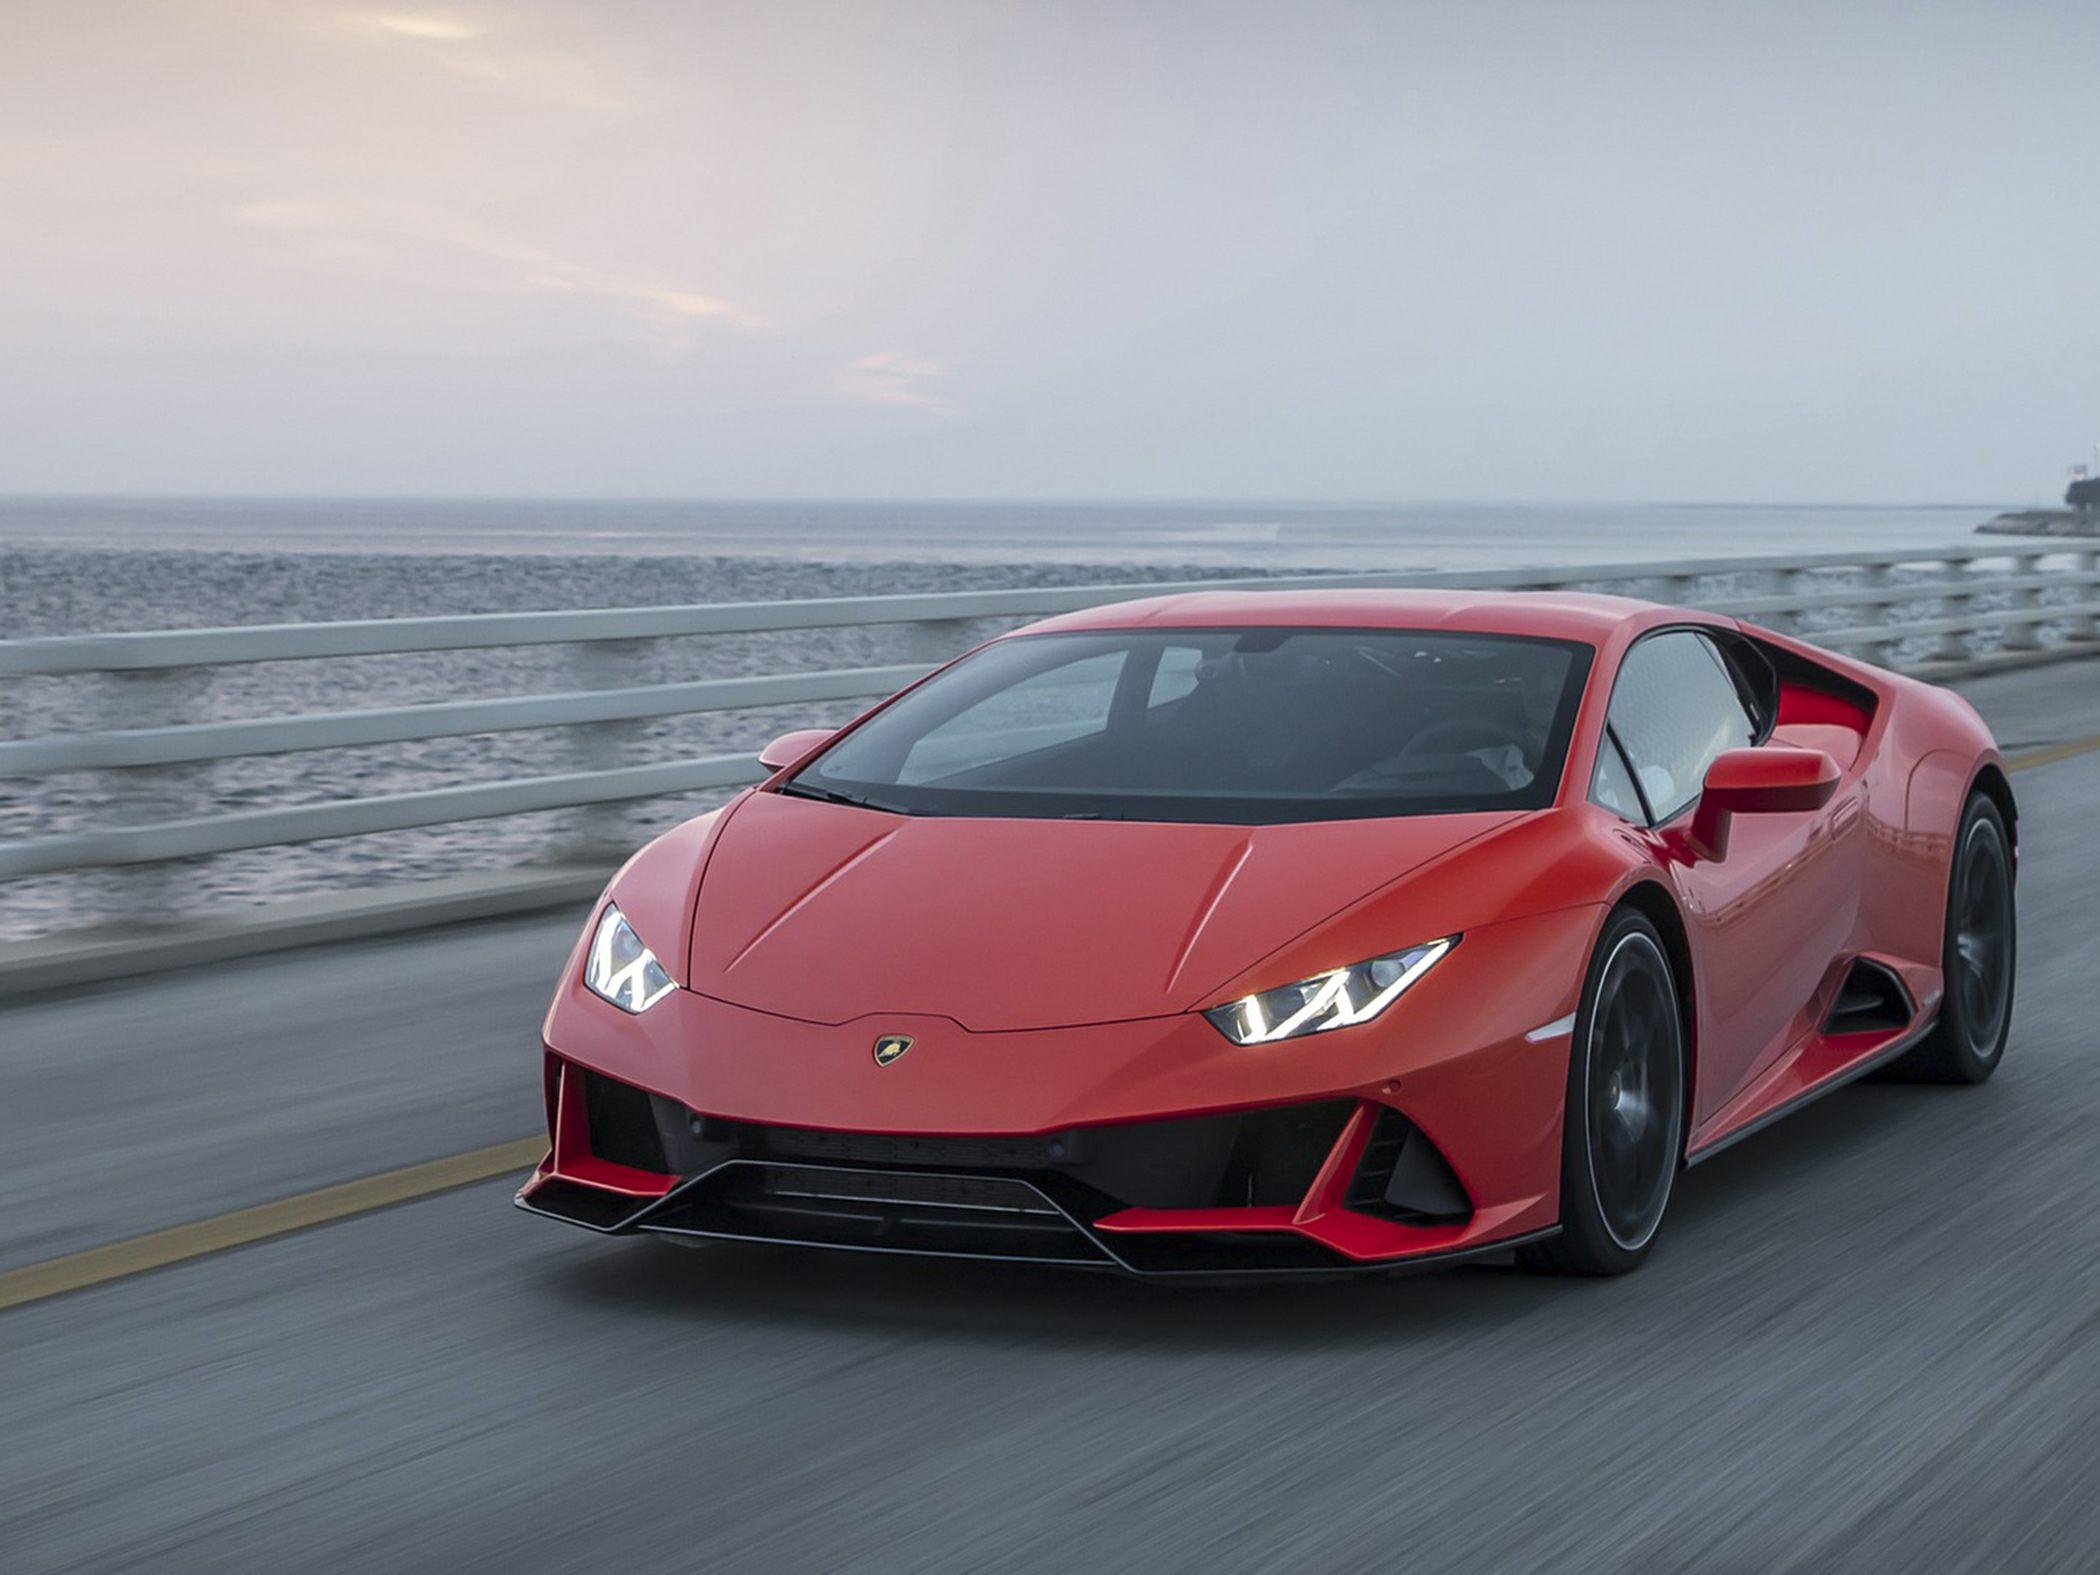 2020 Lamborghini Huracan Evo Specs And Prices